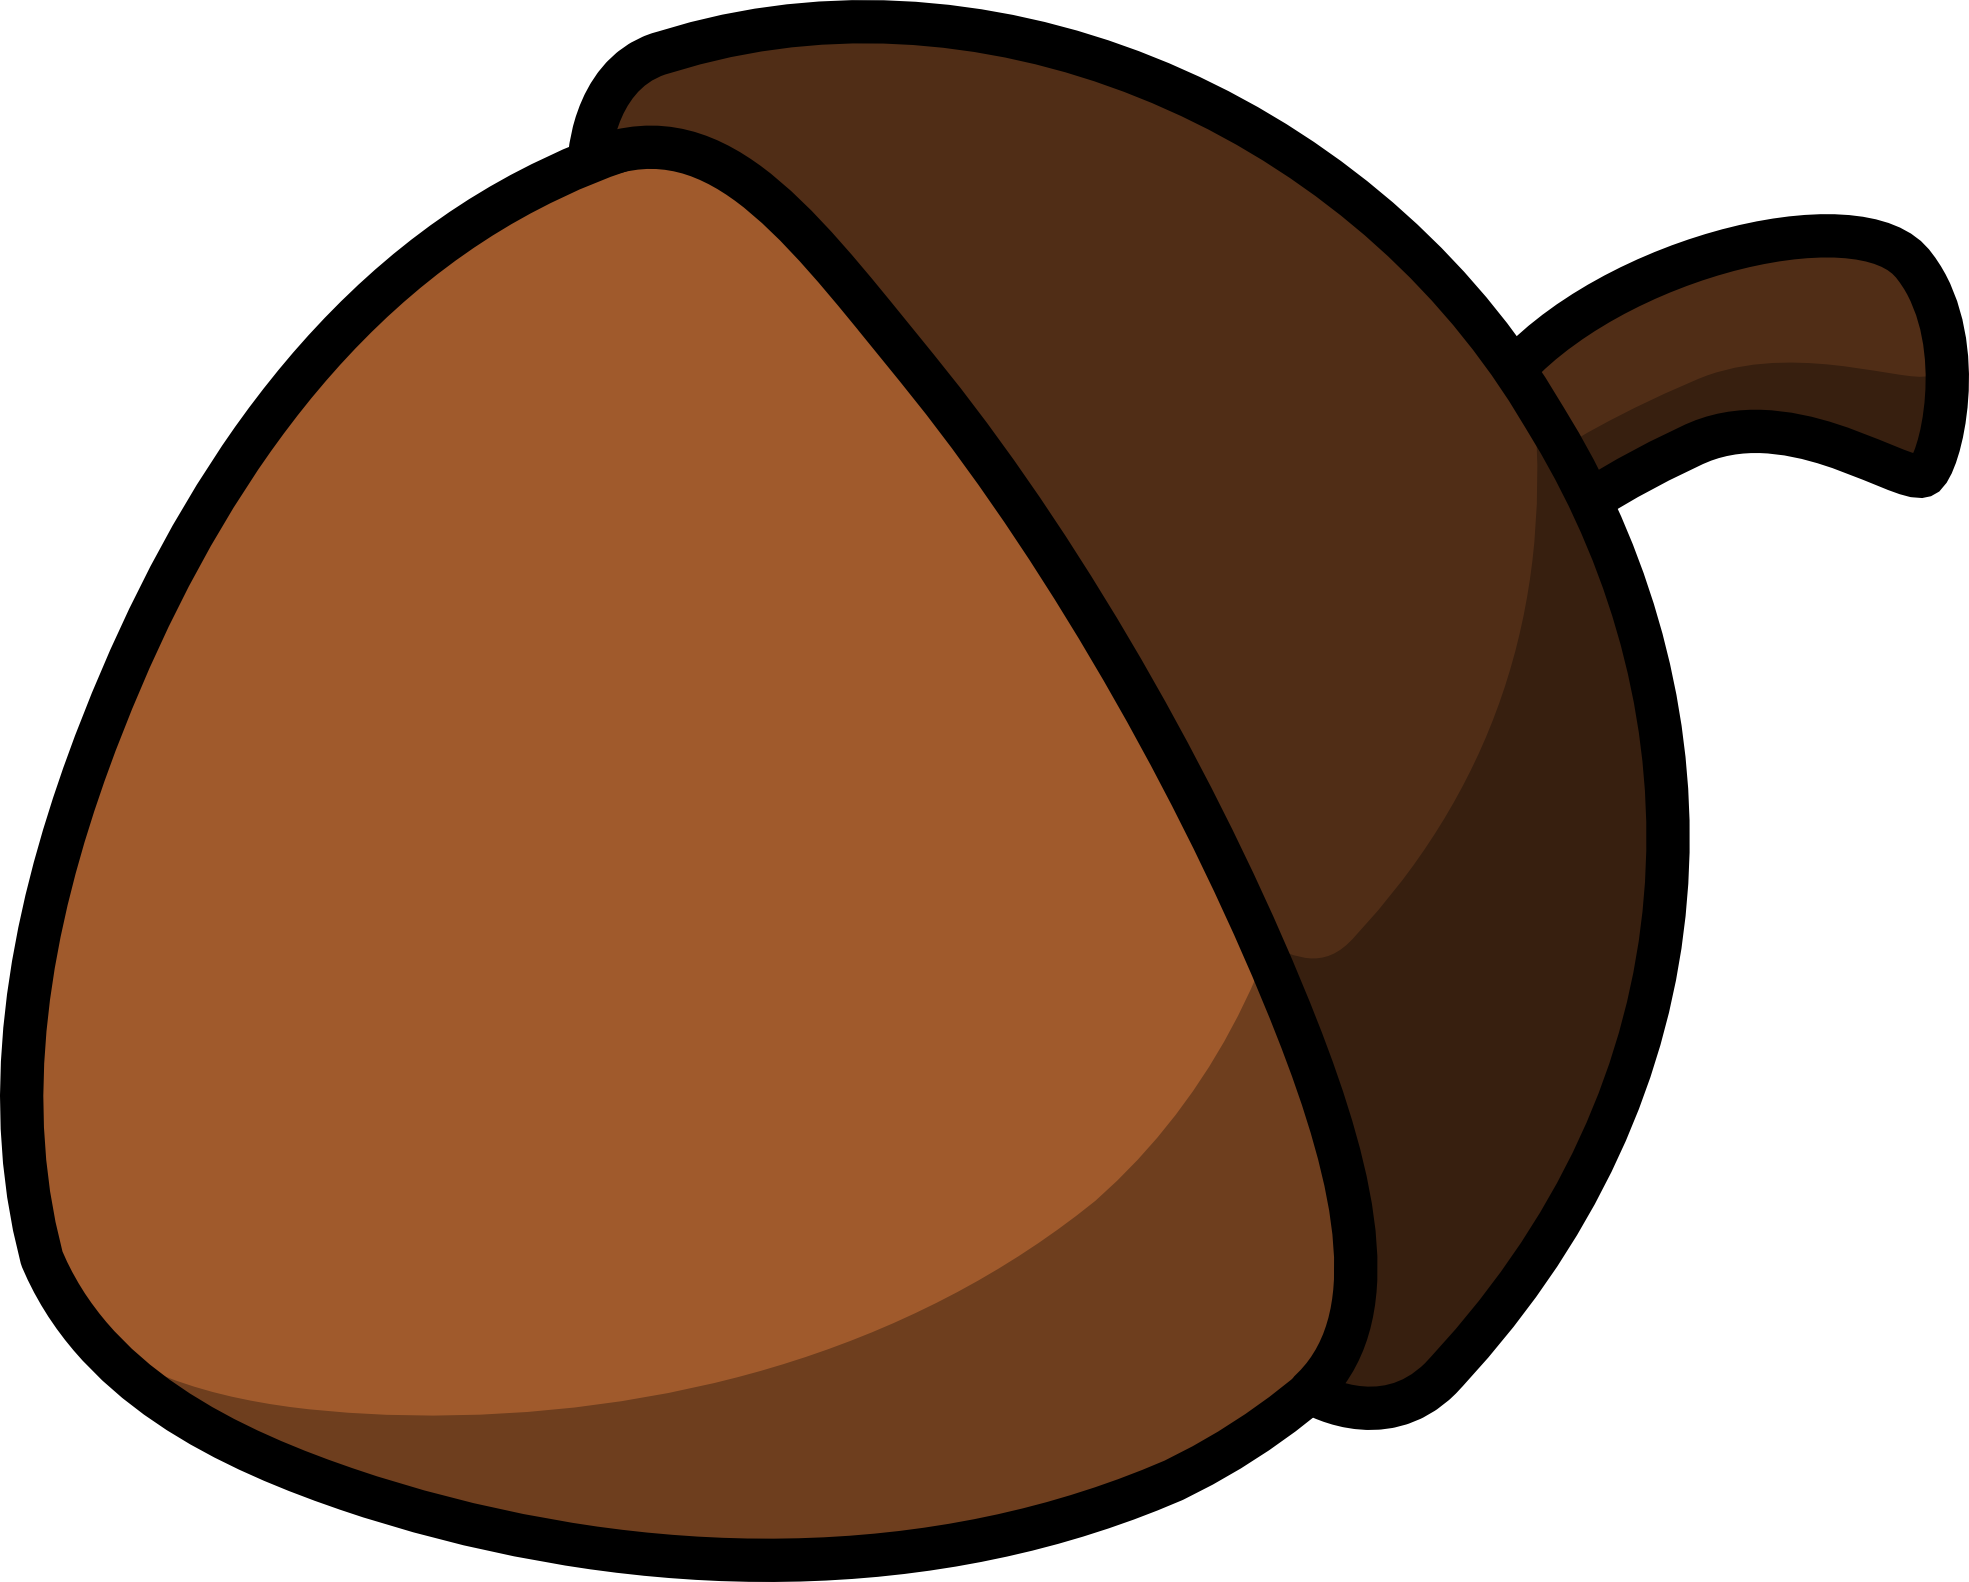 Acorn clipart: 15 acorn clip art.-Acorn clipart: 15 acorn clip art.-0